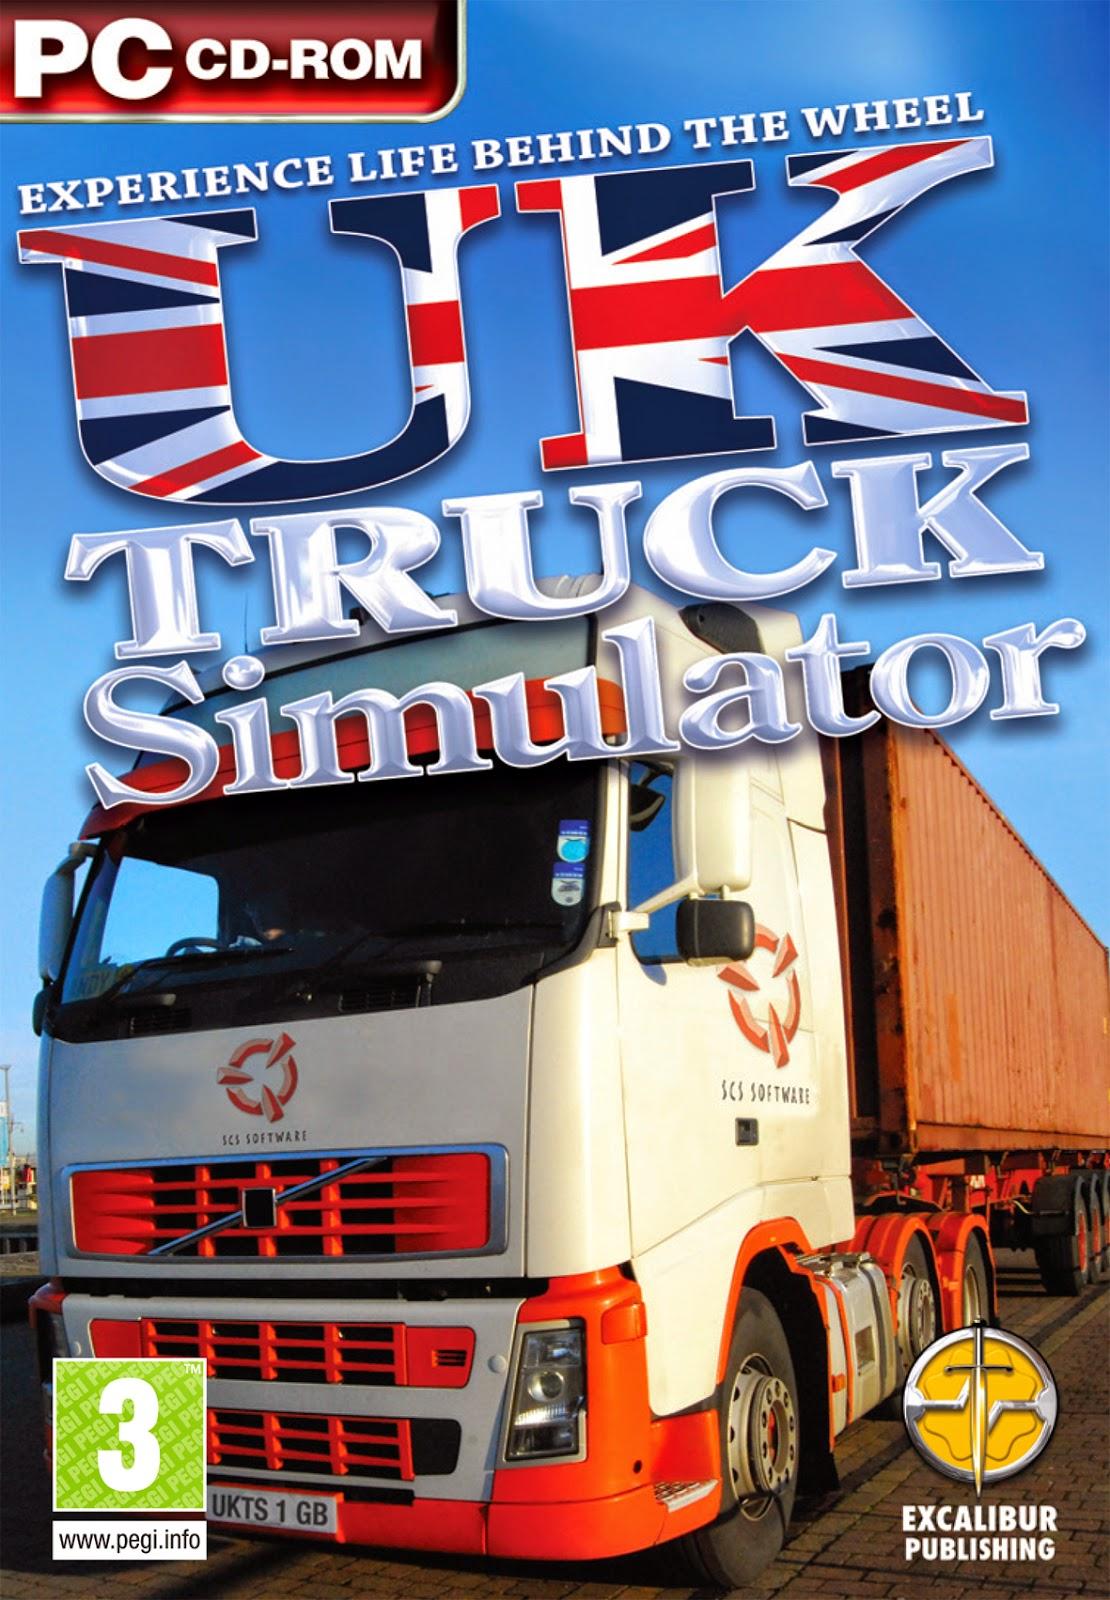 http://bismillah-gratis.blogspot.com/2014/11/BG-uk-truk-simulator-bus-mod-versi-indonesia.html